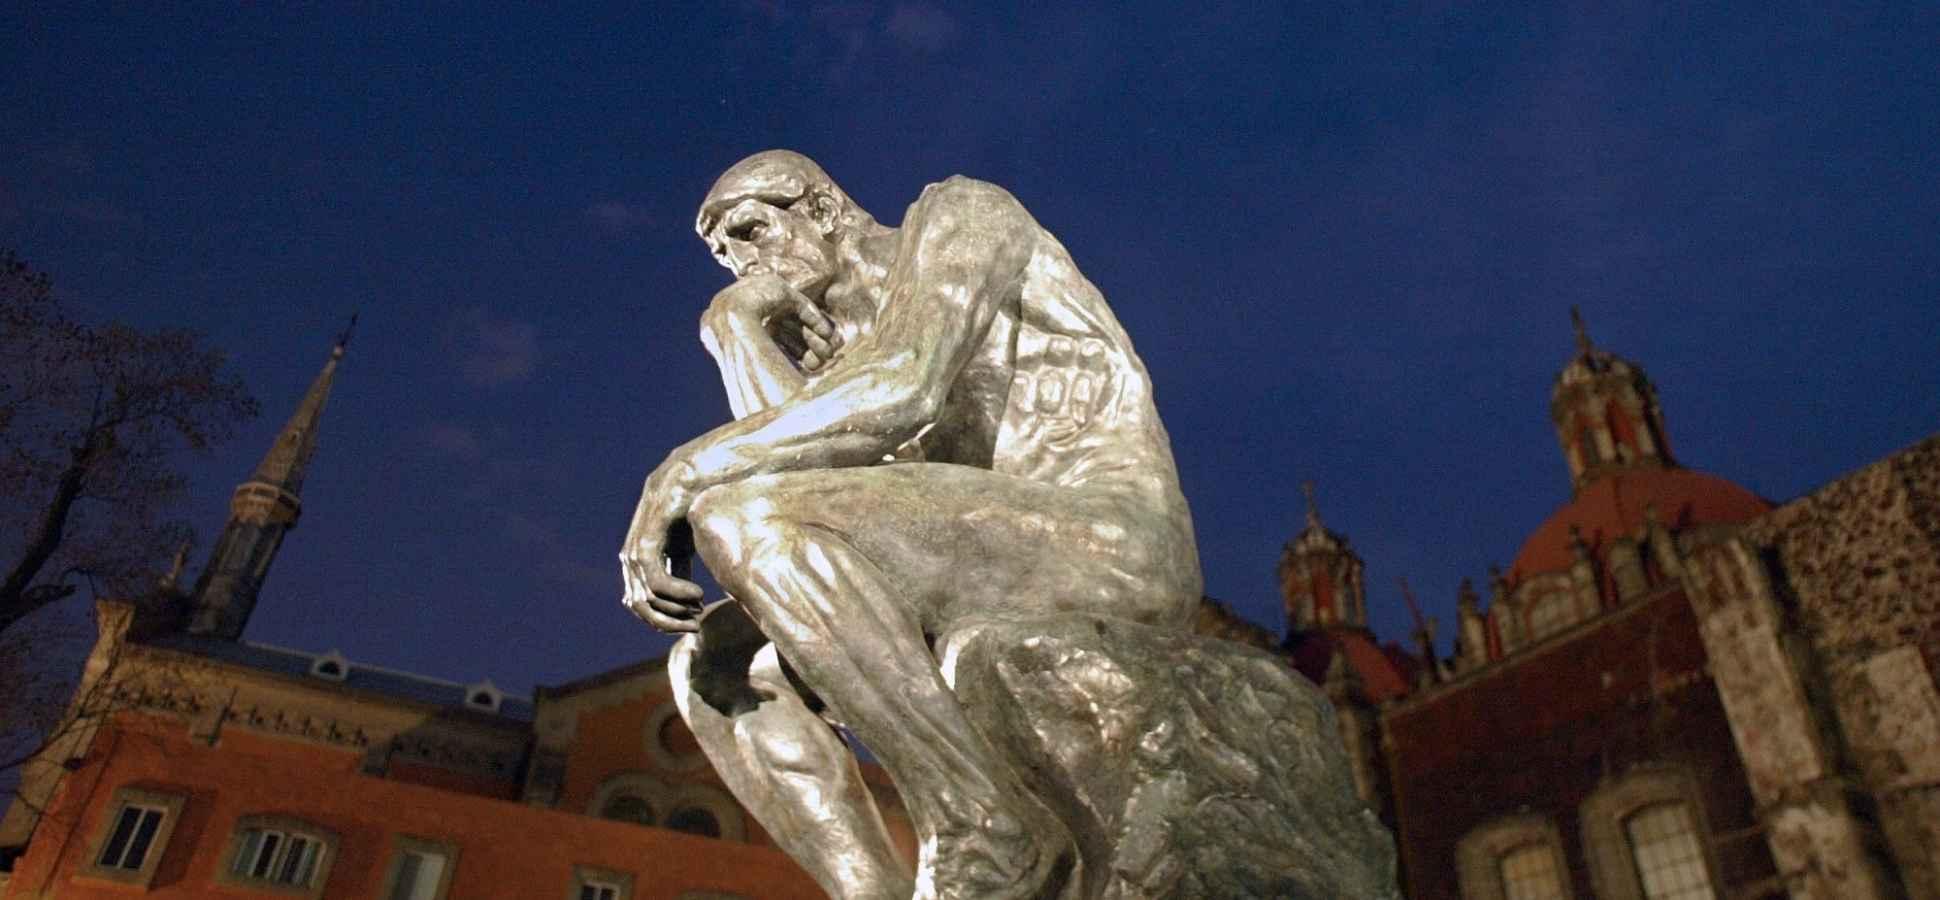 Emotional Intelligence 101: How to Handle Negative Emotions